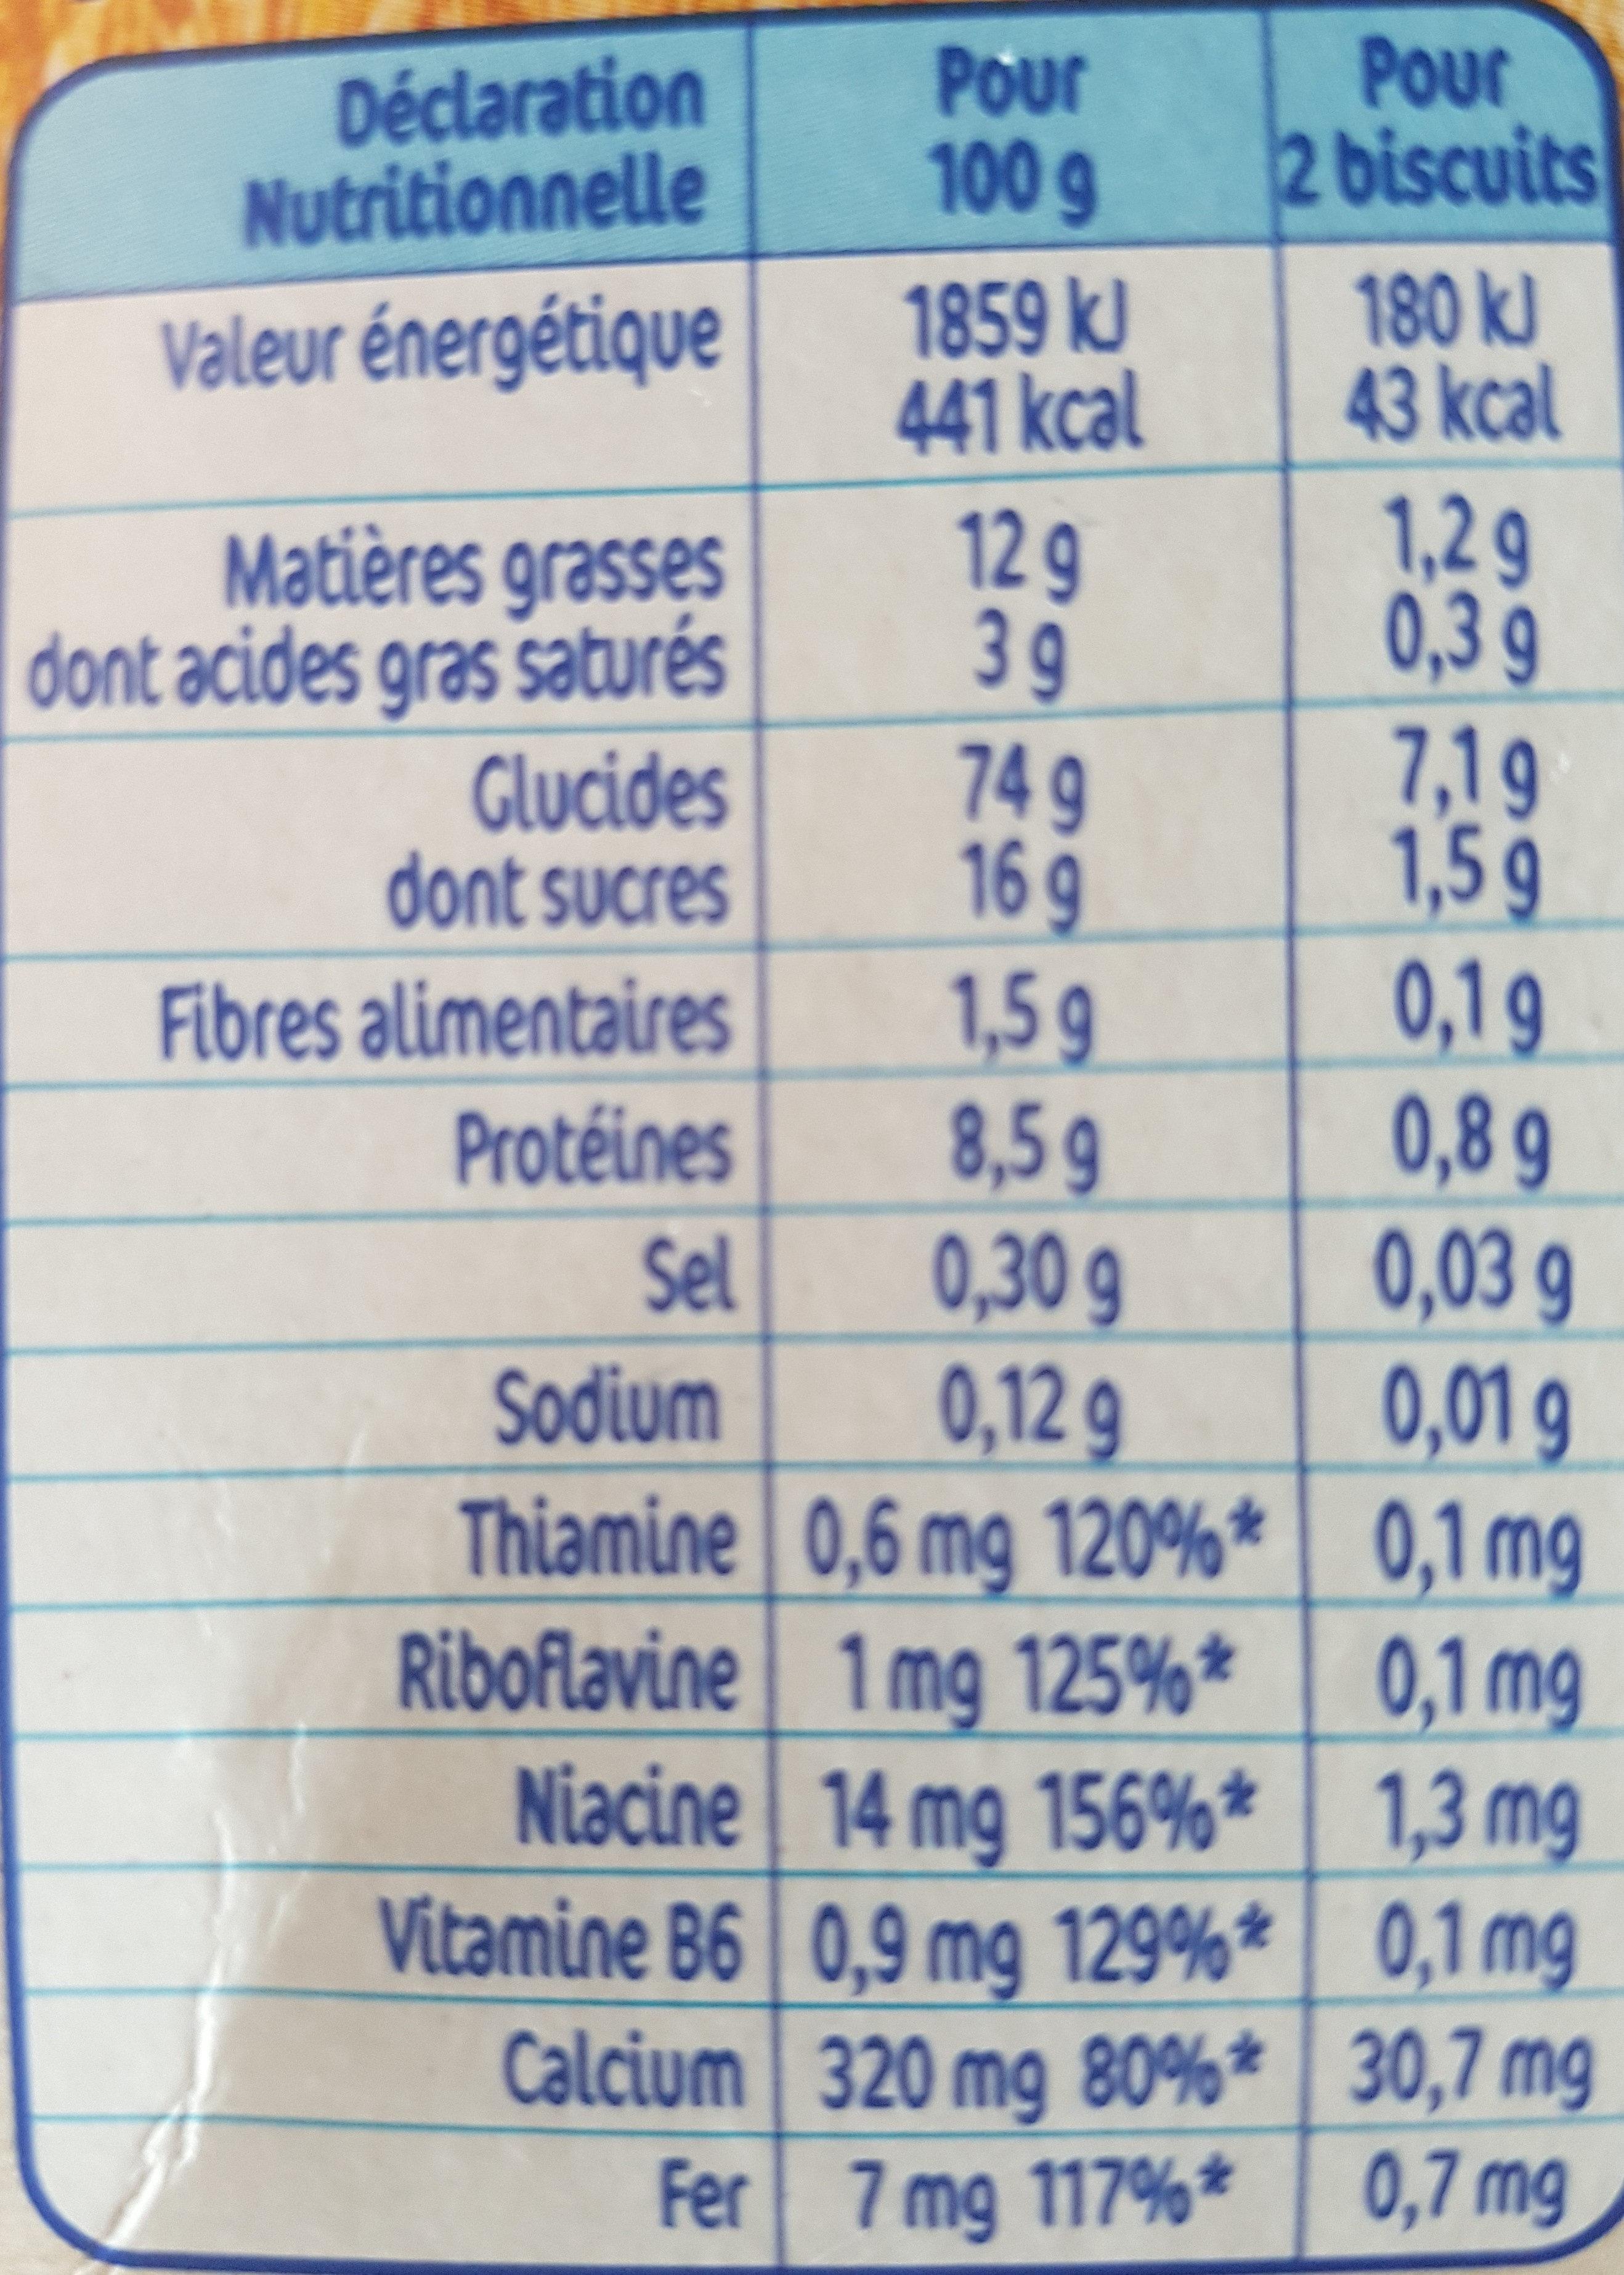 Nestle p'tit biscuit - Nutrition facts